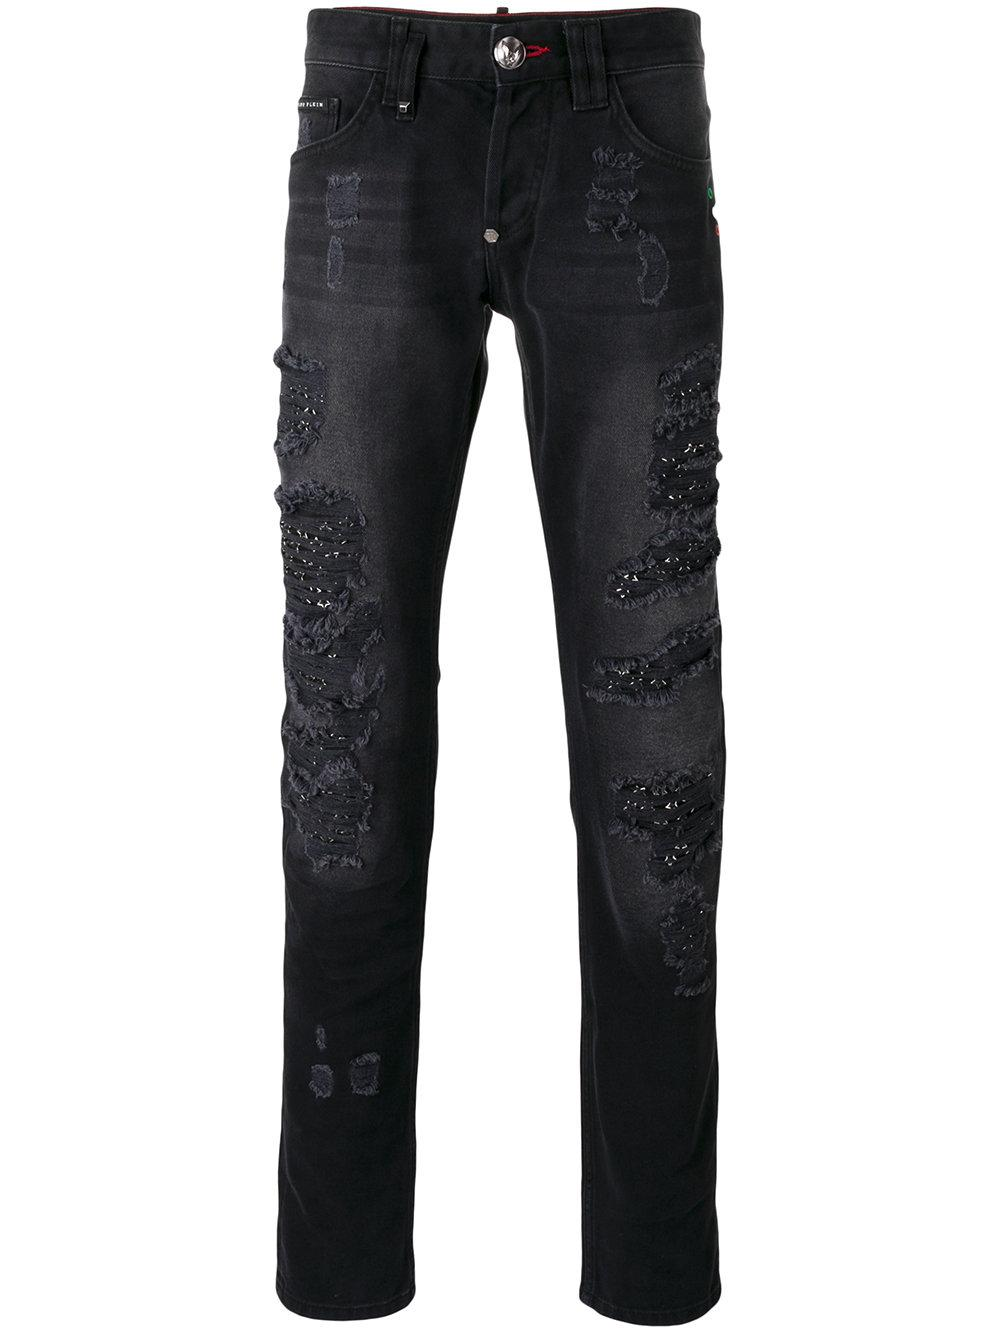 philipp plein crystal straight leg jeans in black for men lyst. Black Bedroom Furniture Sets. Home Design Ideas